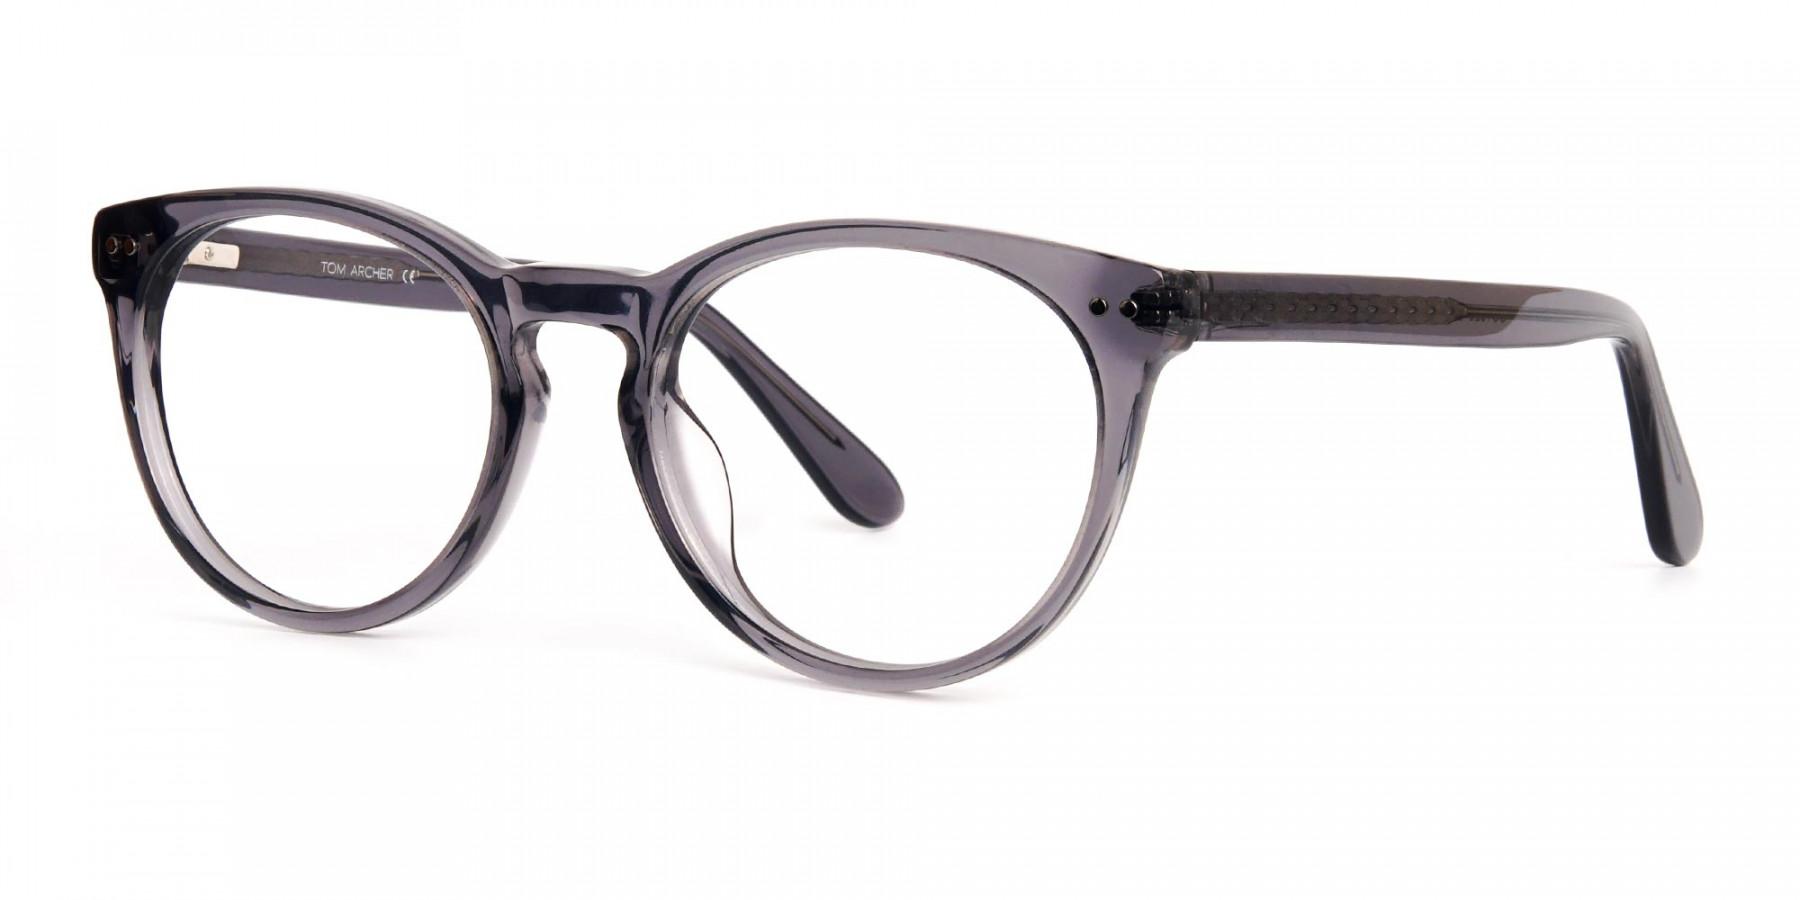 transparent-grey-round-full-rim-glasses-frames-1